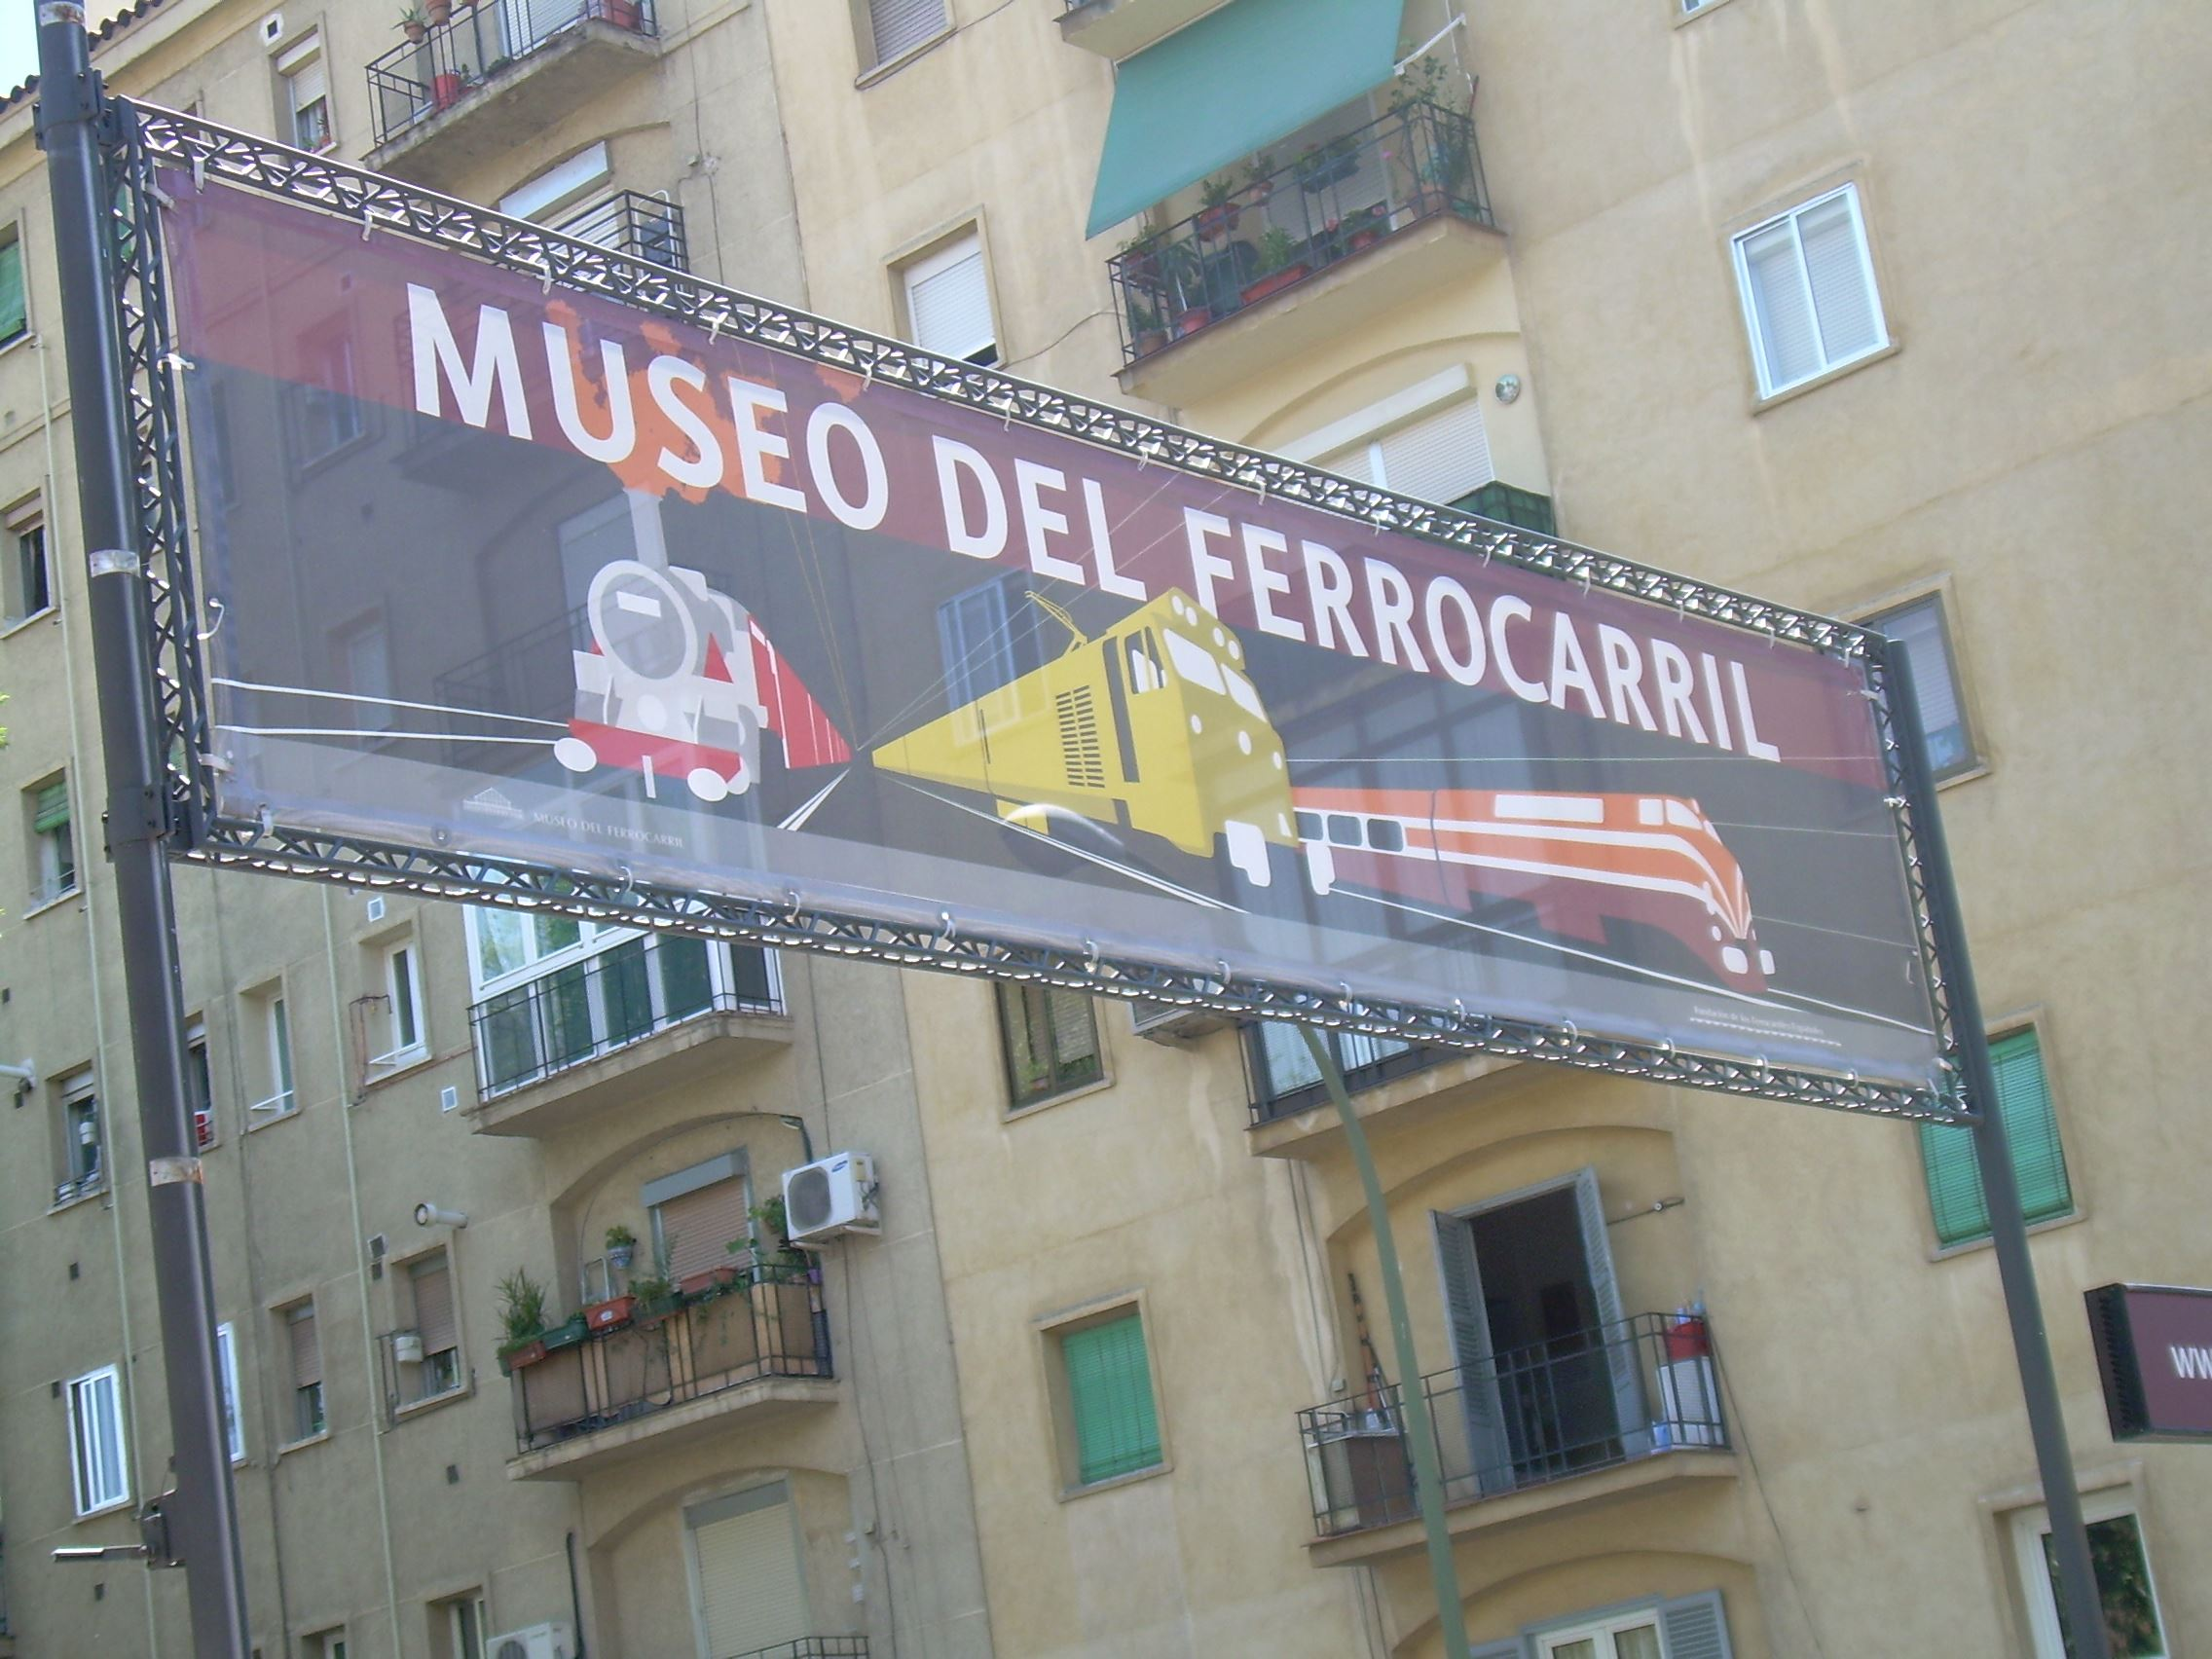 Museo ferrocarril Delicias_01